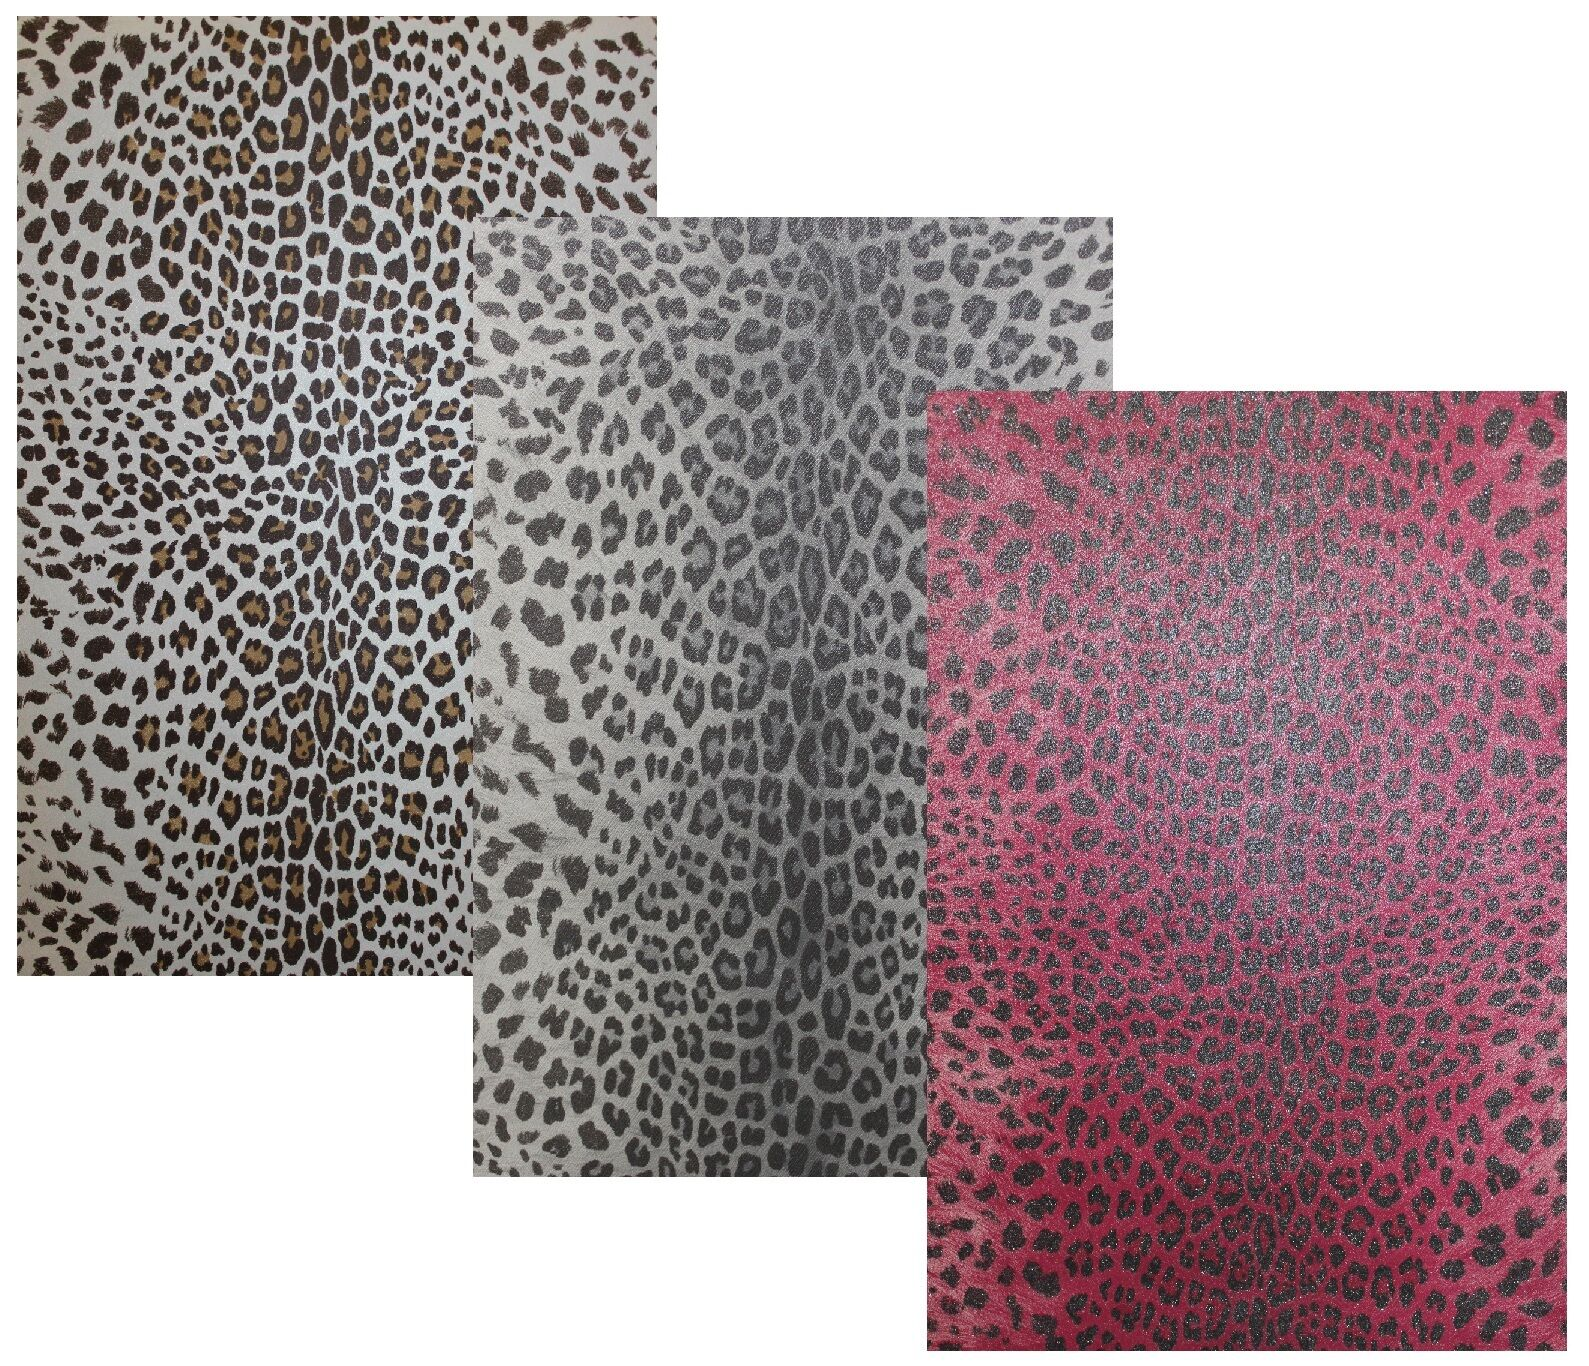 vlies tapete leoparden optik fell braun weiss beige grau silber pink arfika stil ebay. Black Bedroom Furniture Sets. Home Design Ideas